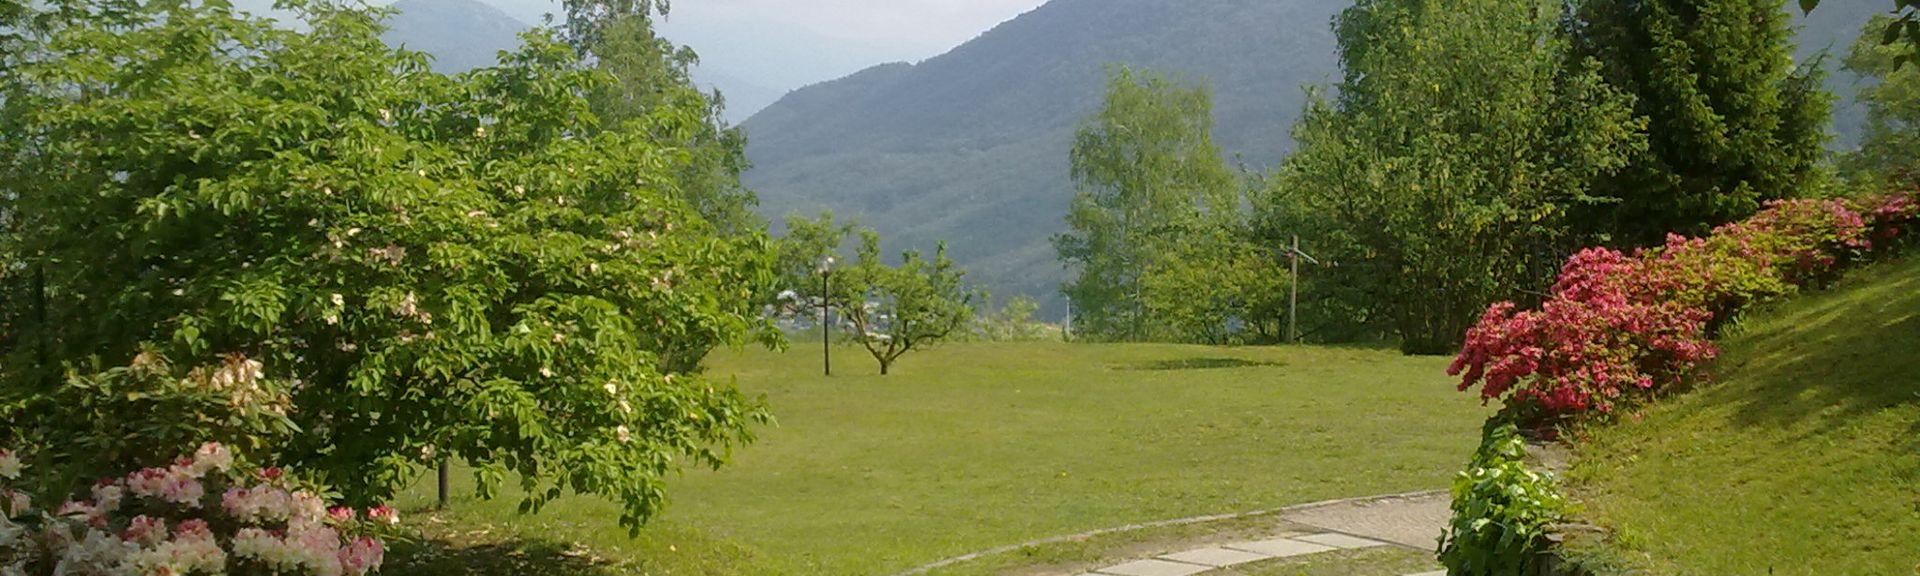 Belgirate, Verbano-Cusio-Ossola, Piedmont, Italy